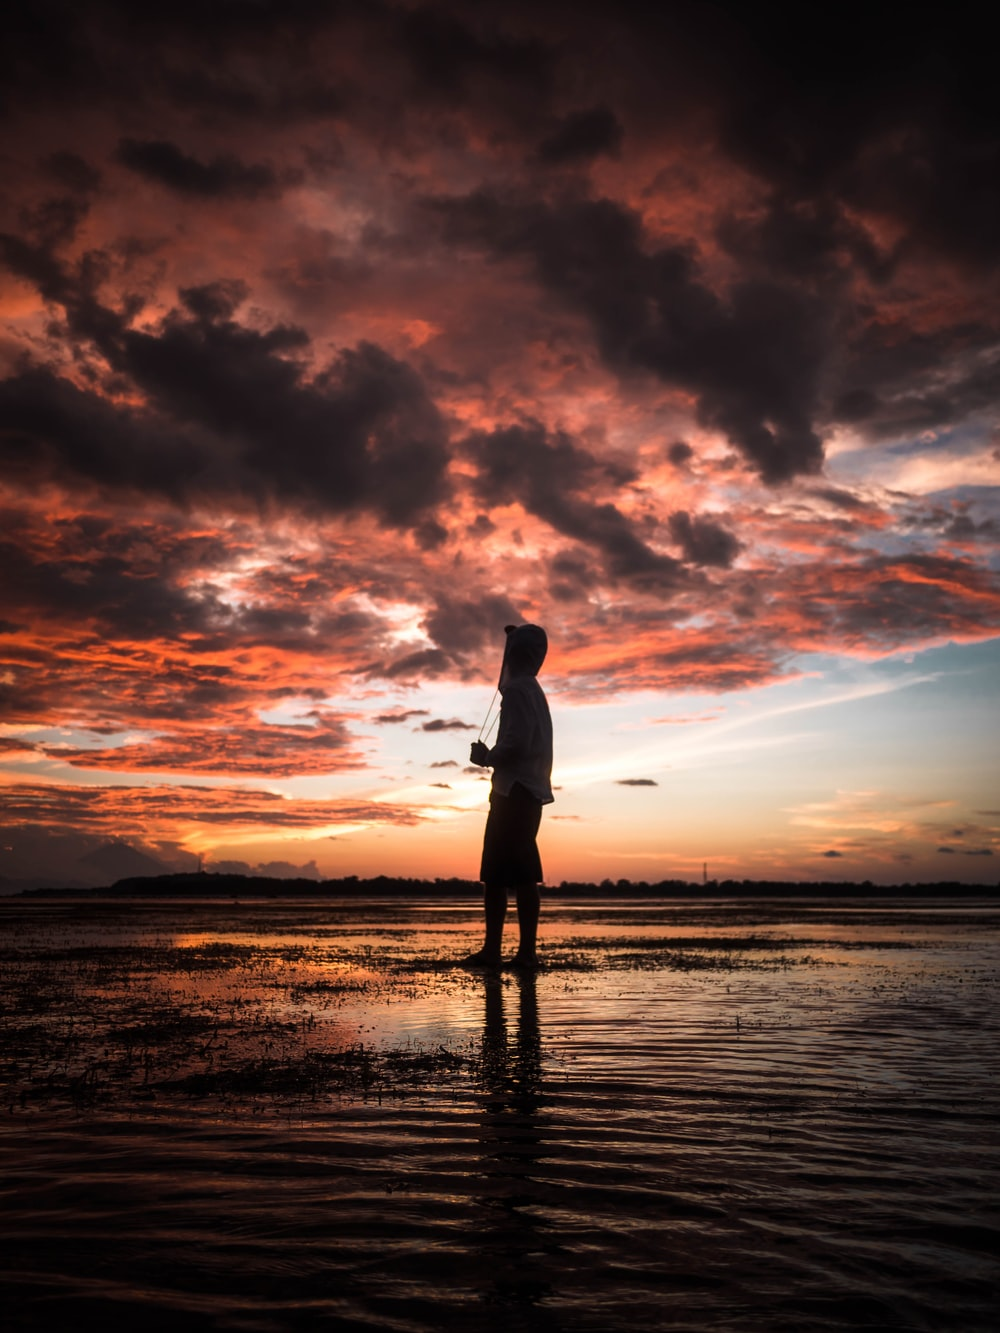 man standing in seashore during sunset